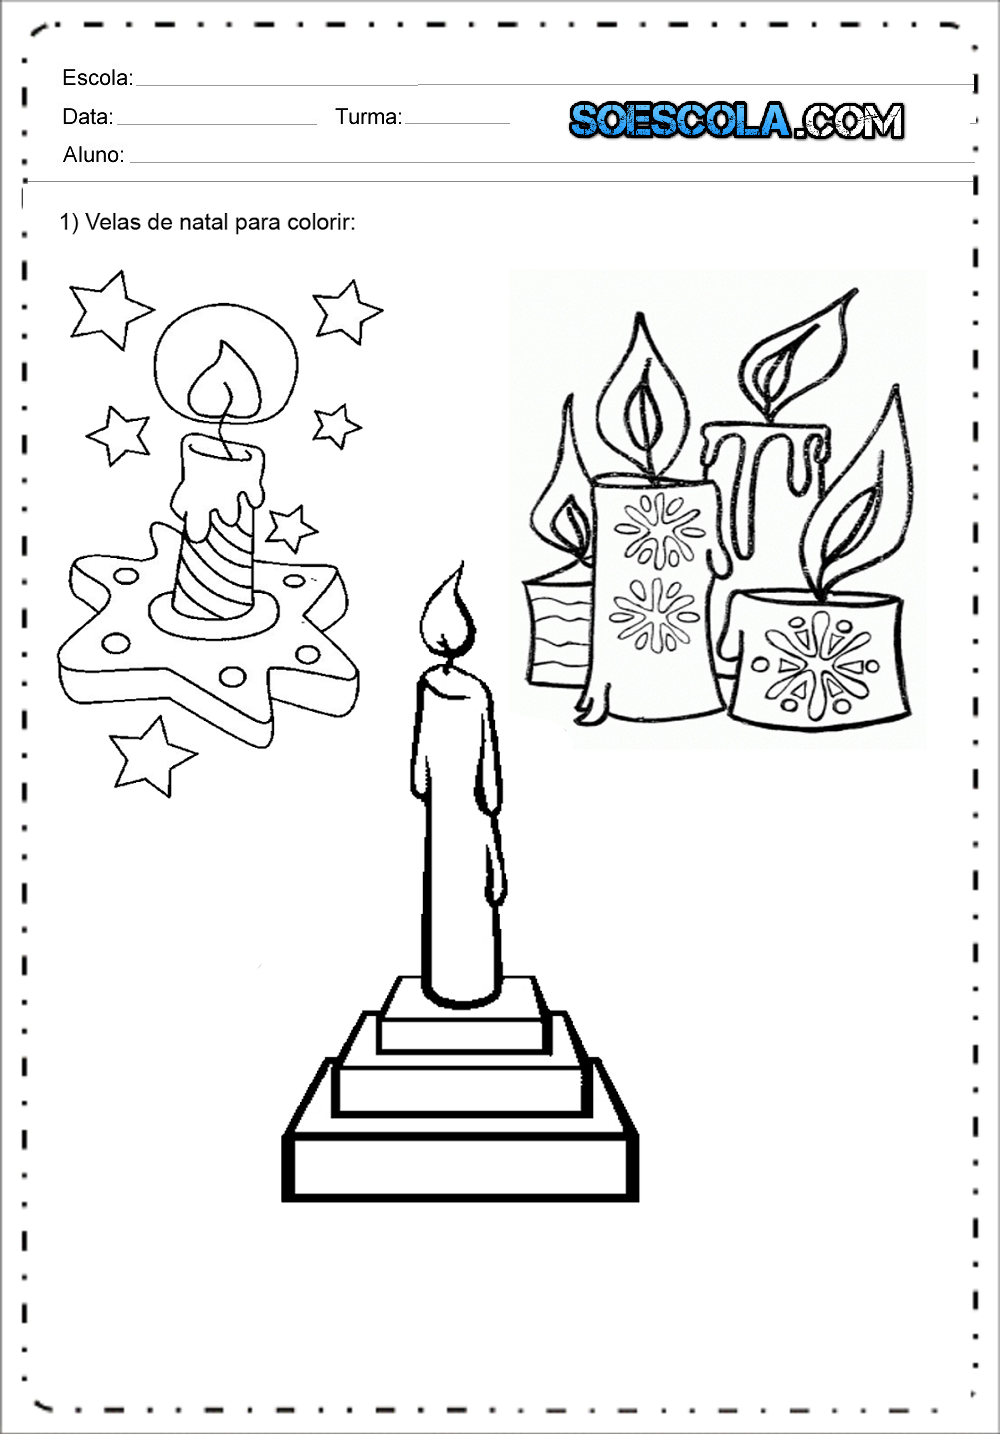 desenhos de velas de natal para colorir e imprimir sÓ escola